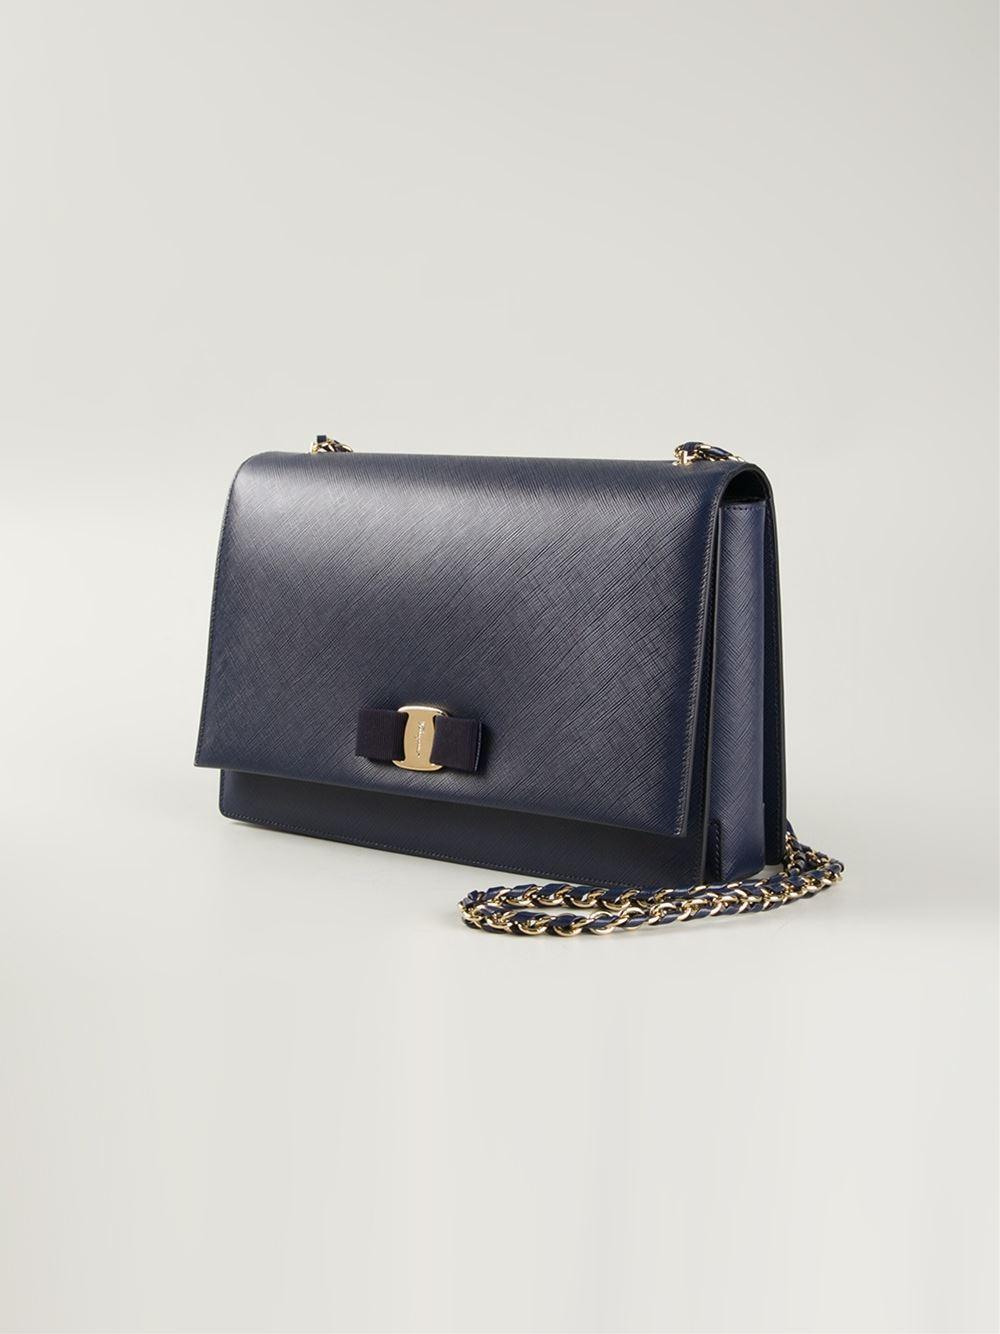 Ferragamo Ginny Leather Cross-Body Bag in Blue